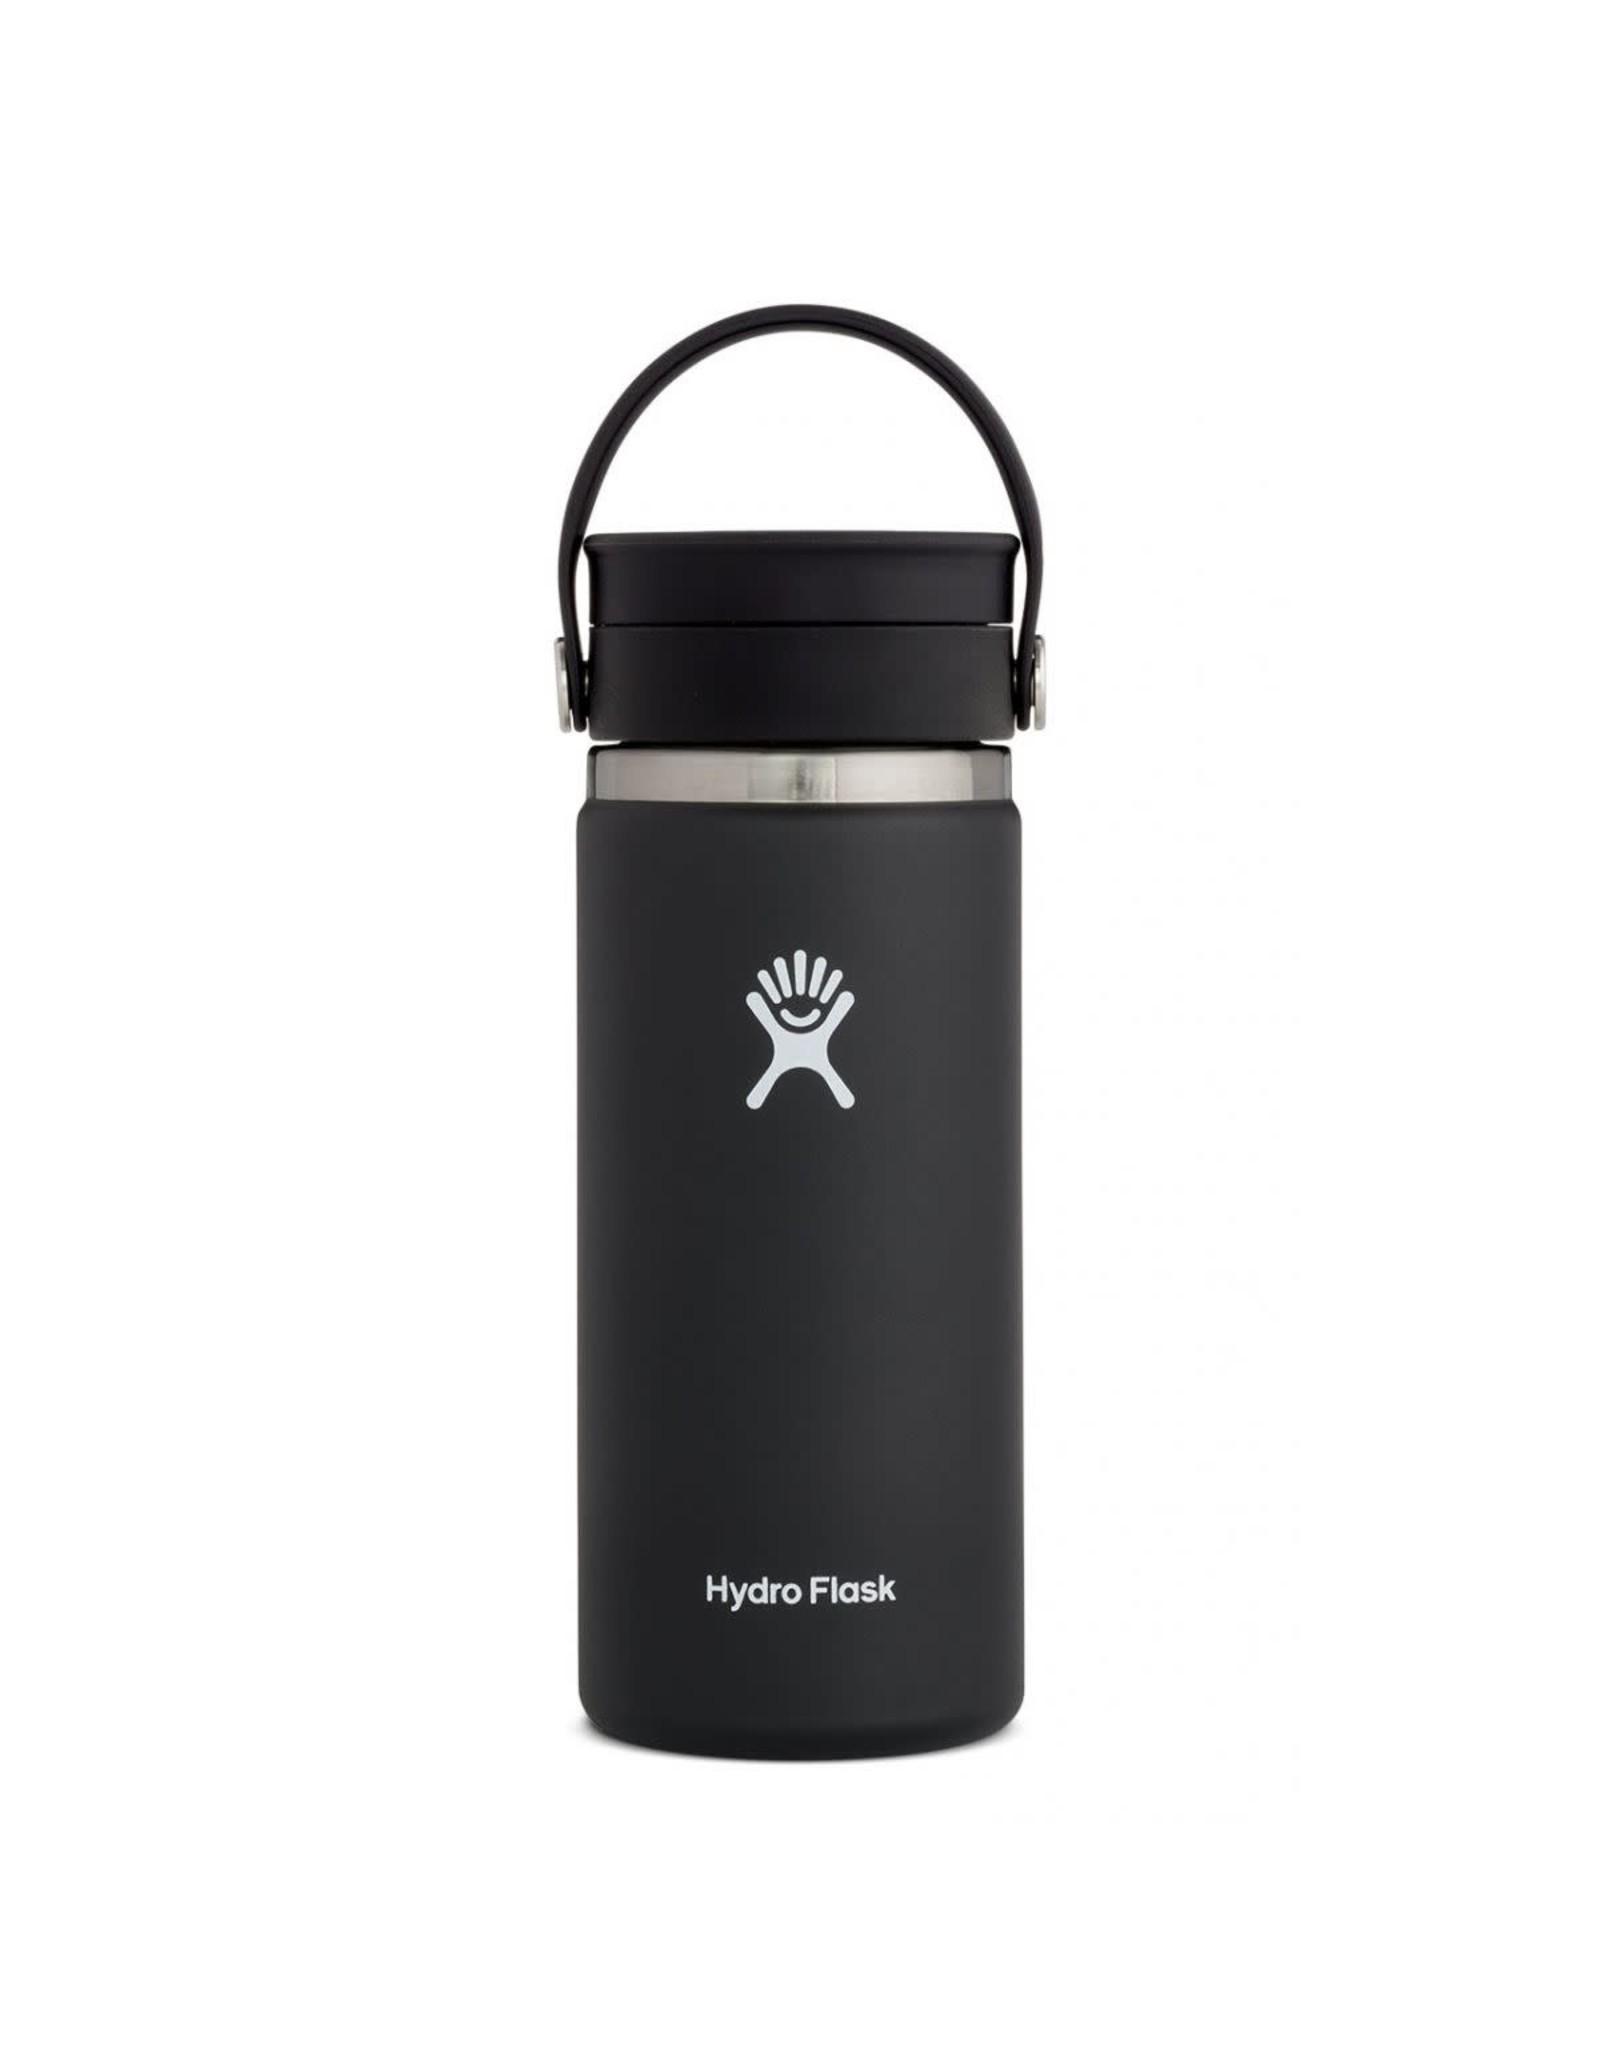 Hydro Flask Hydro Flask 16oz Wide Mouth Flex Sip Lid Black